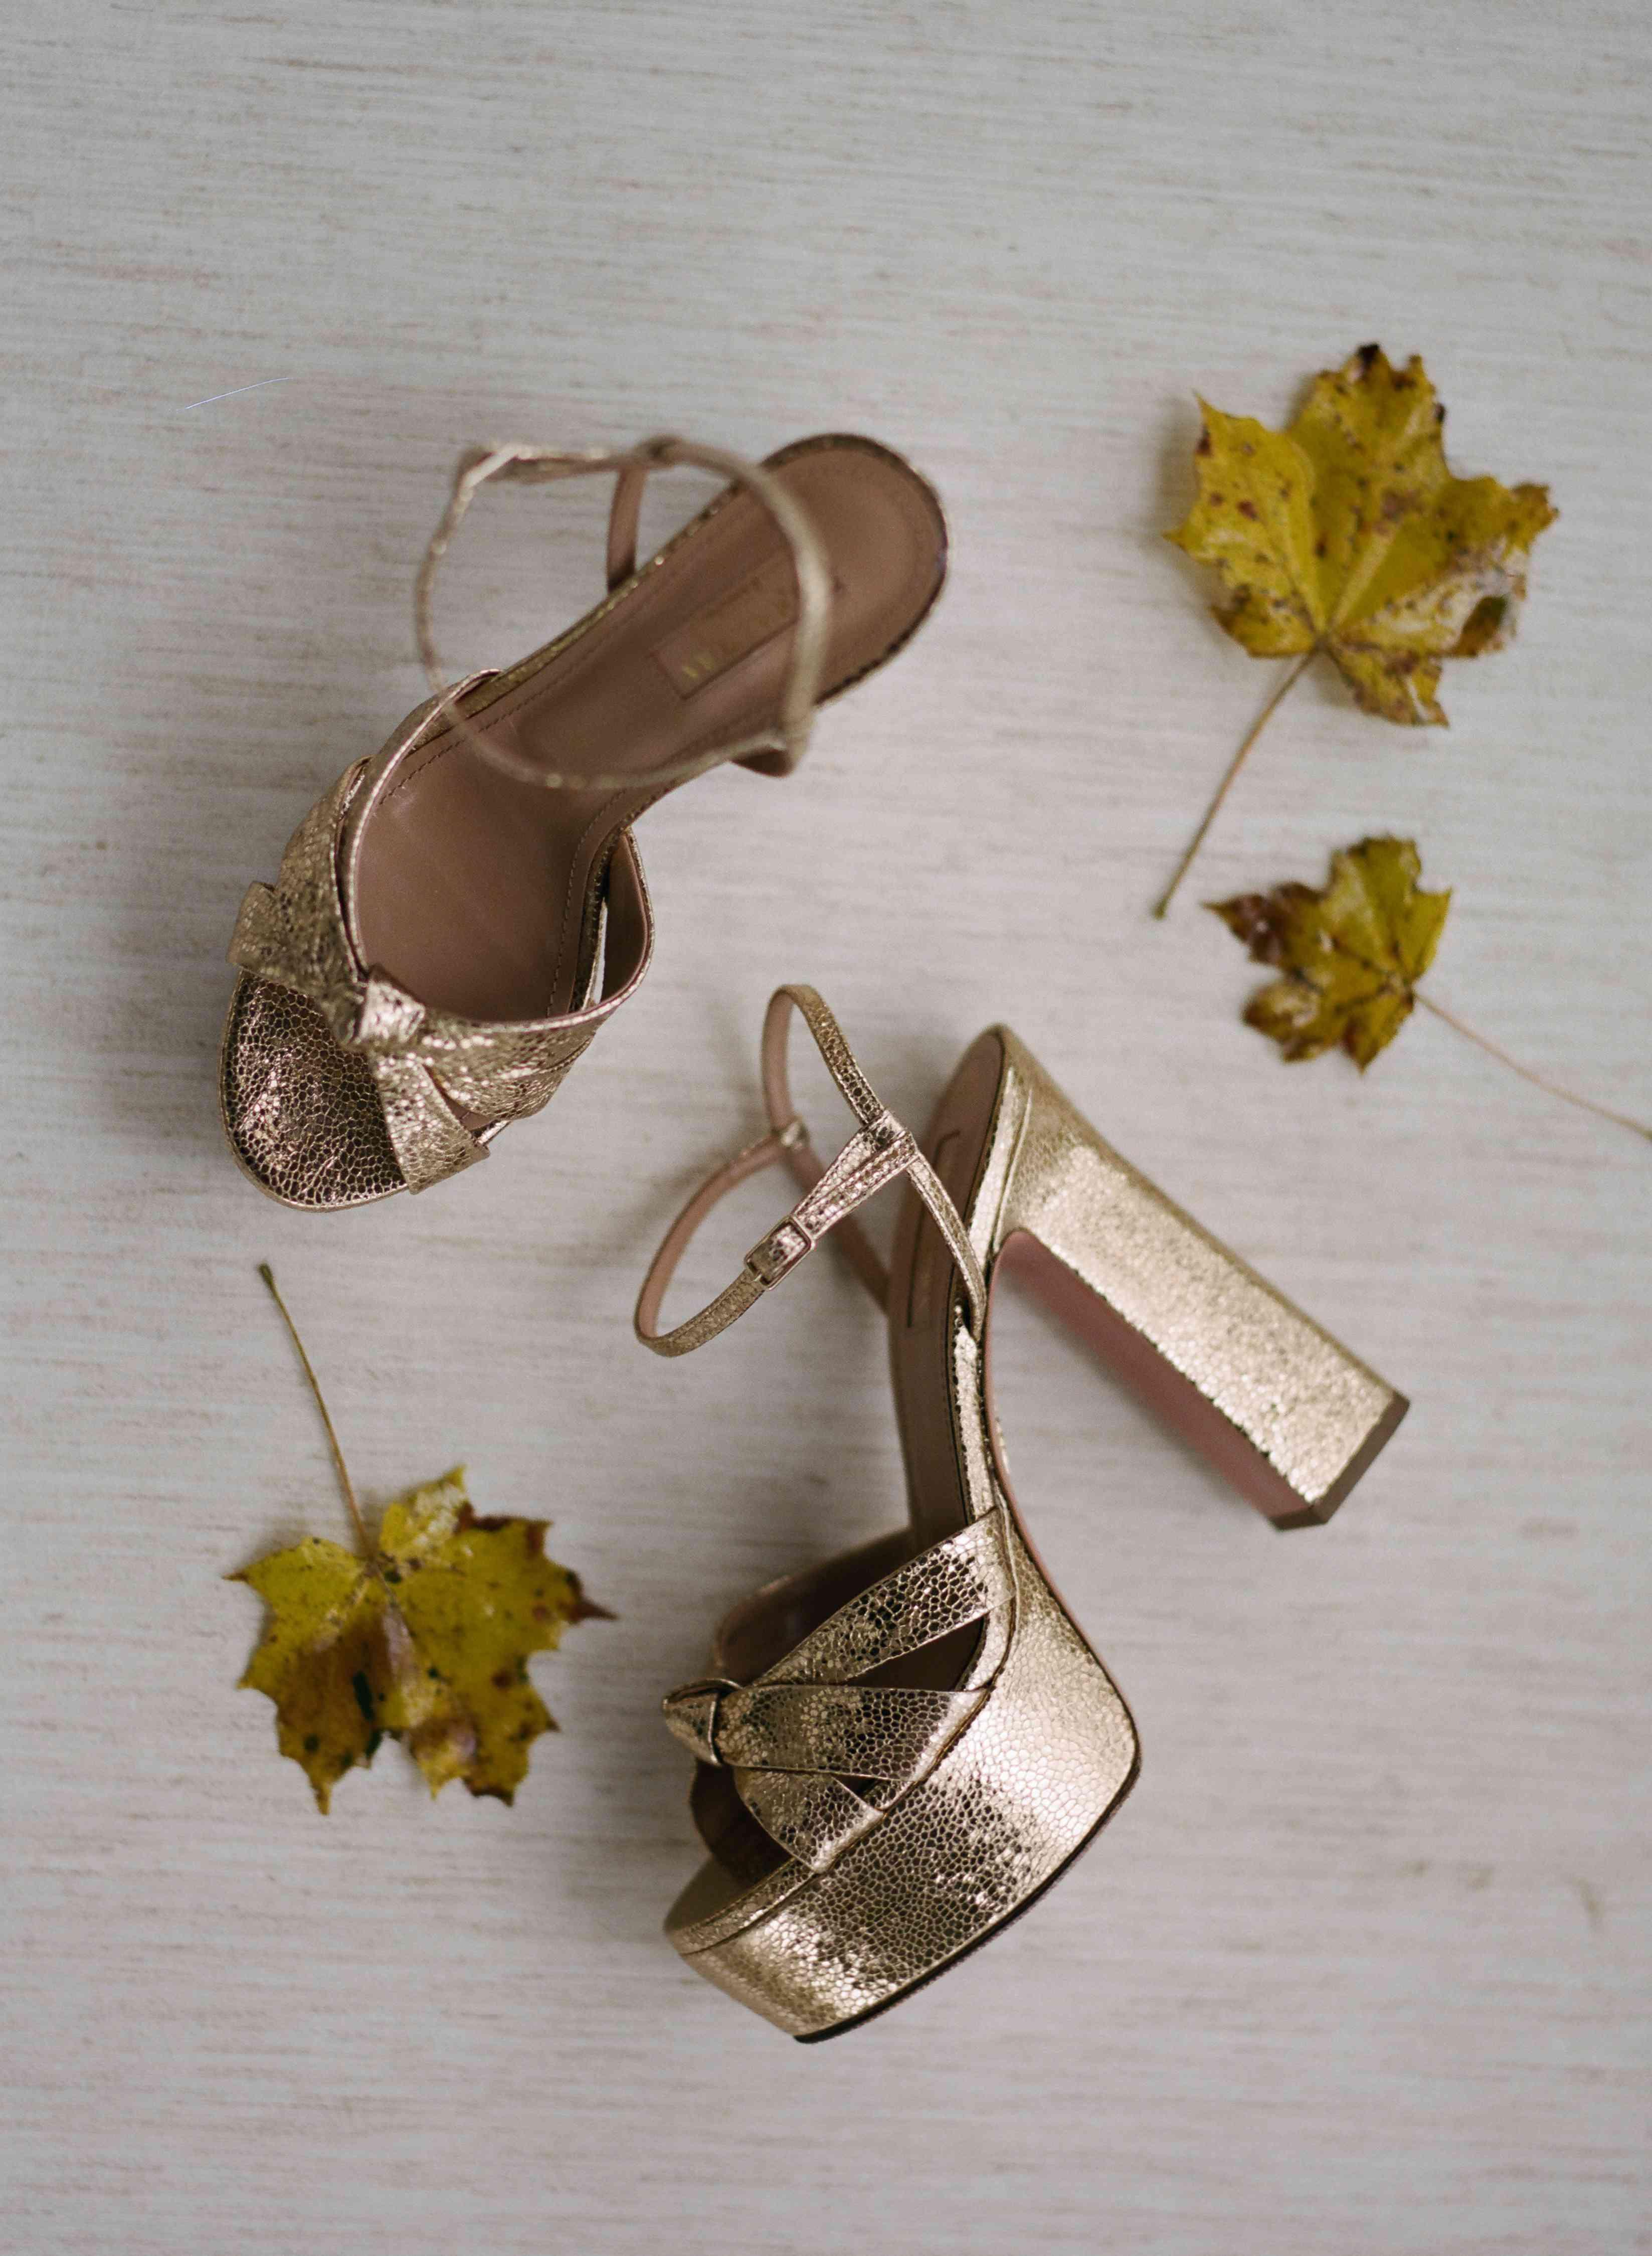 Altuzarra platform sandals